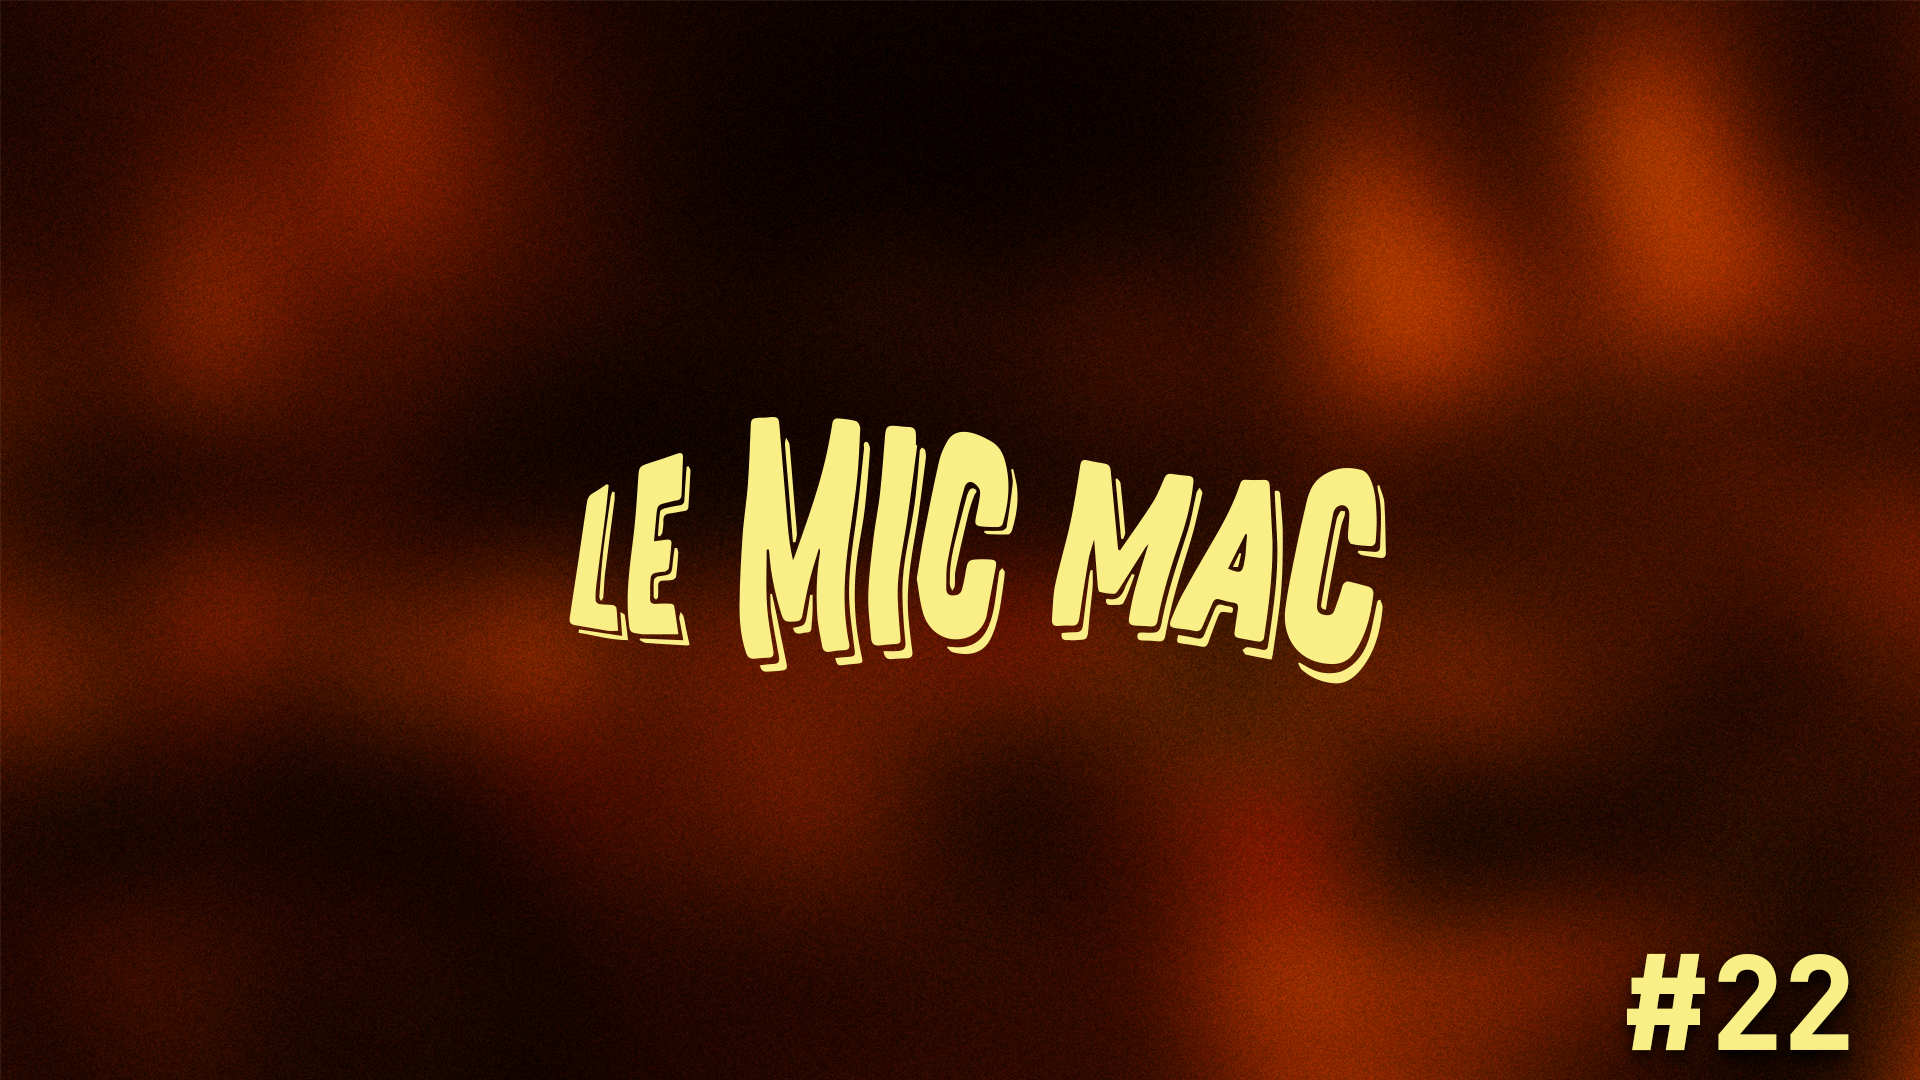 Au Tour du Mic – Mic Mac #22: 11/09/2019 au 06/10/2019